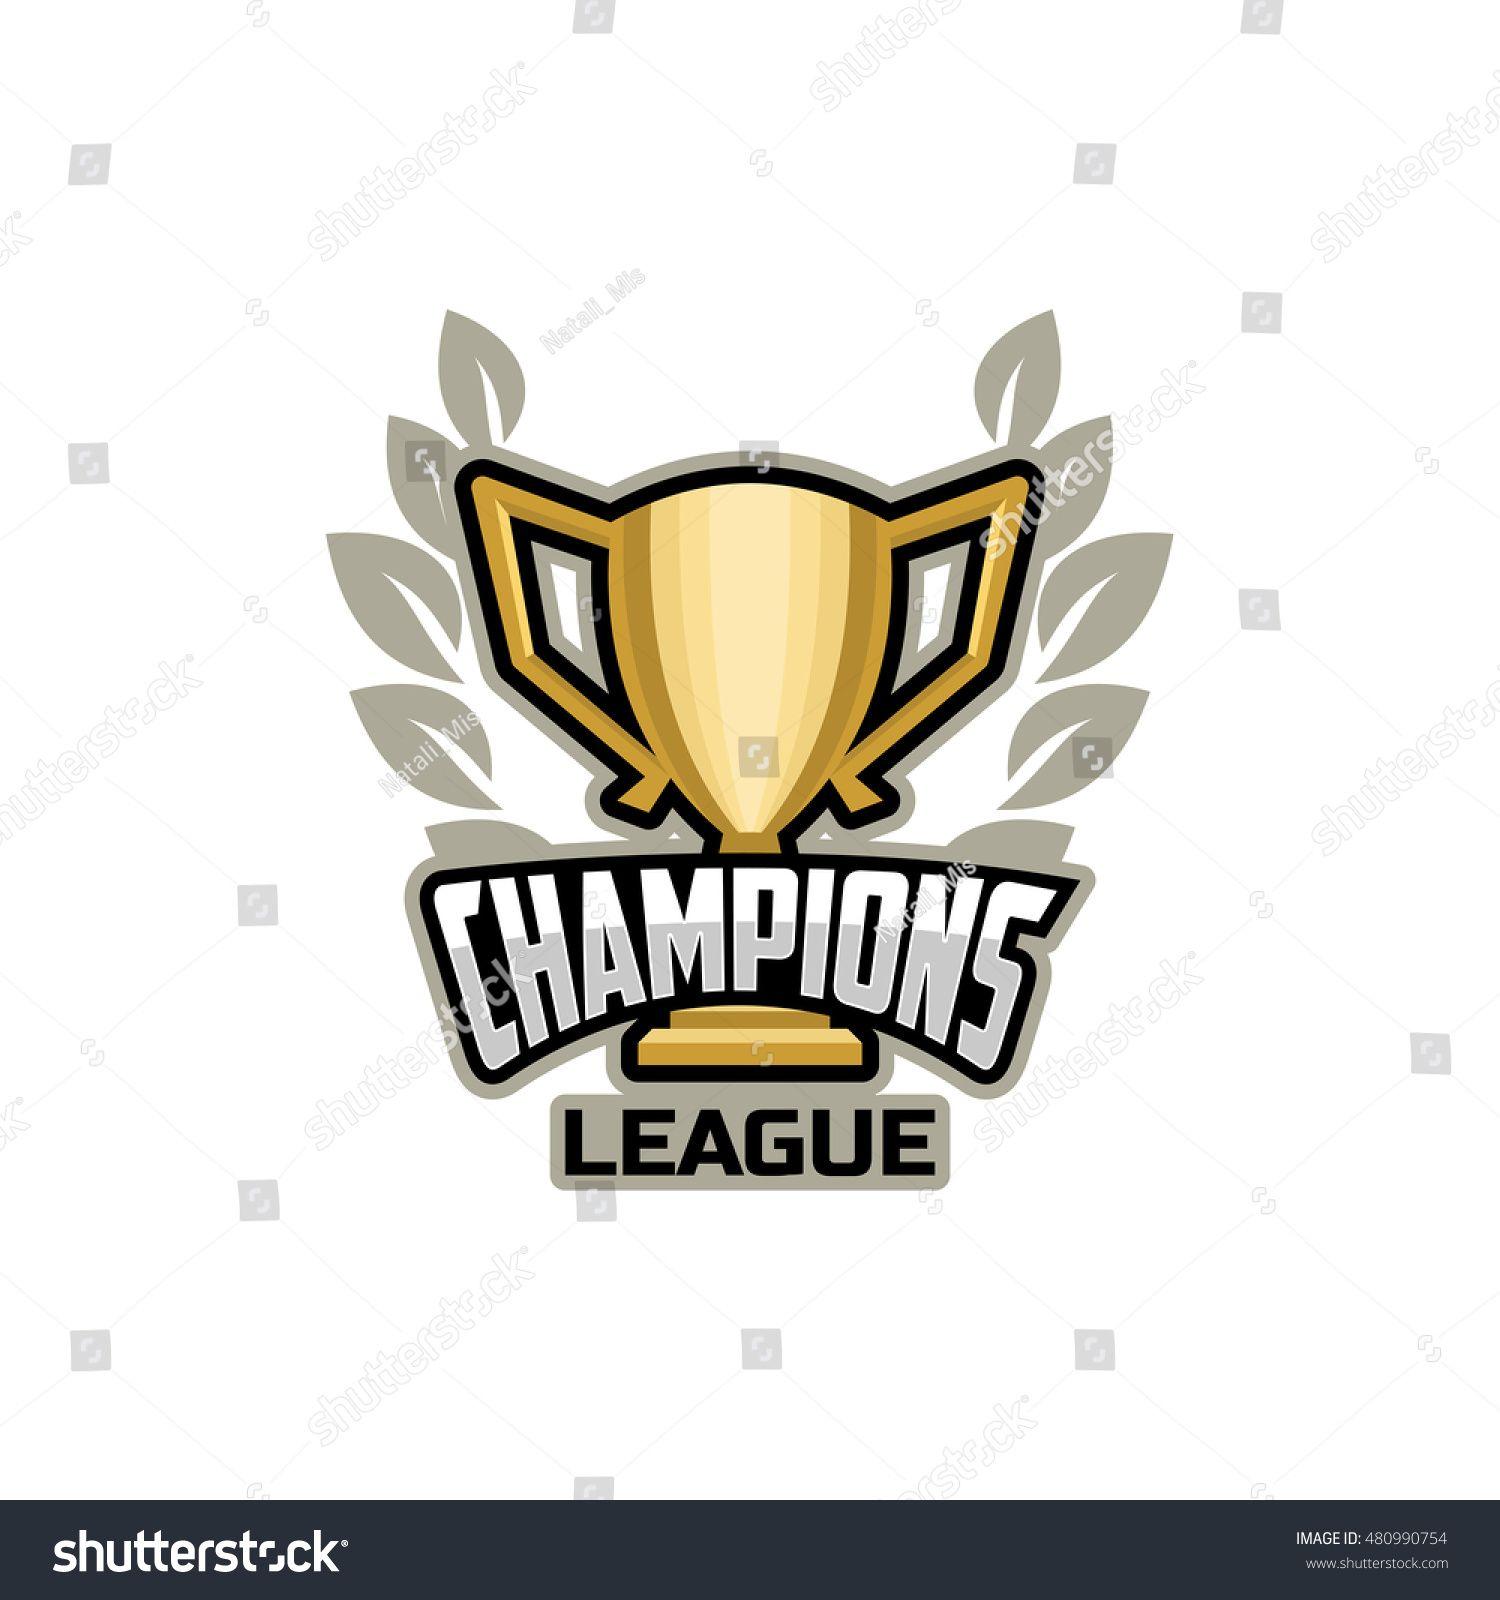 Champions sports league logo, emblem, illustration, banner